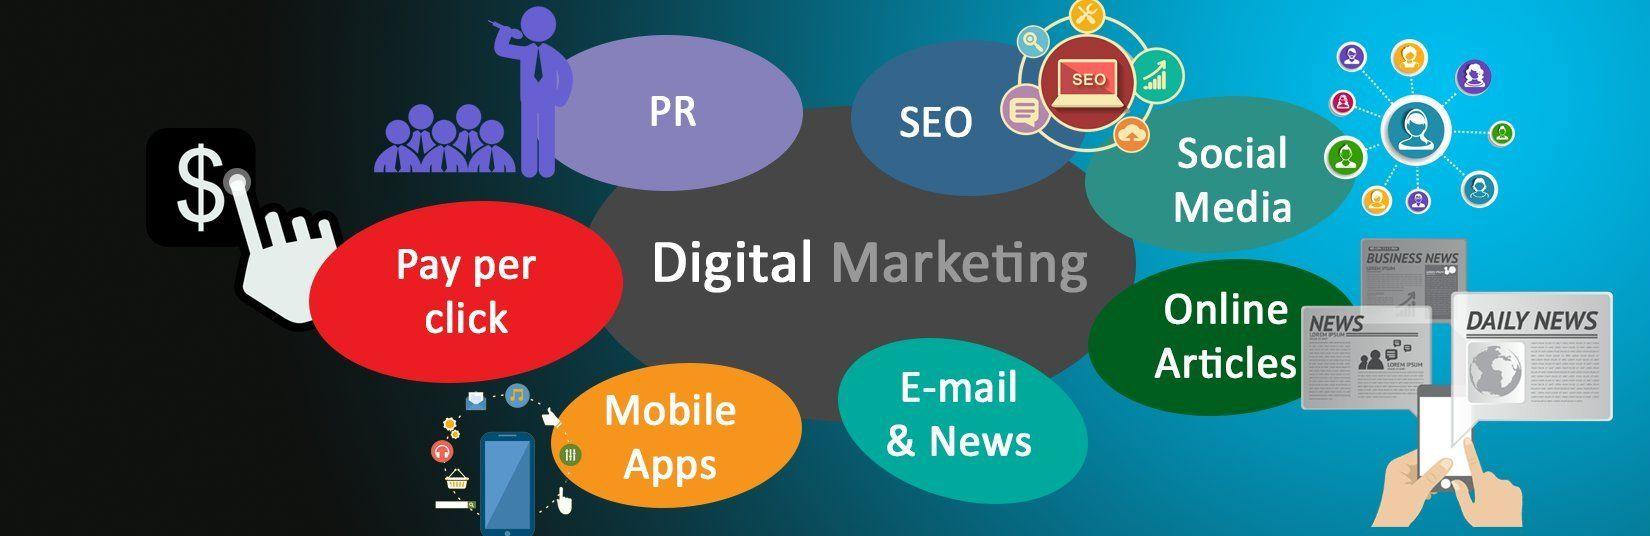 digital-marketing-digital-marketing (7)